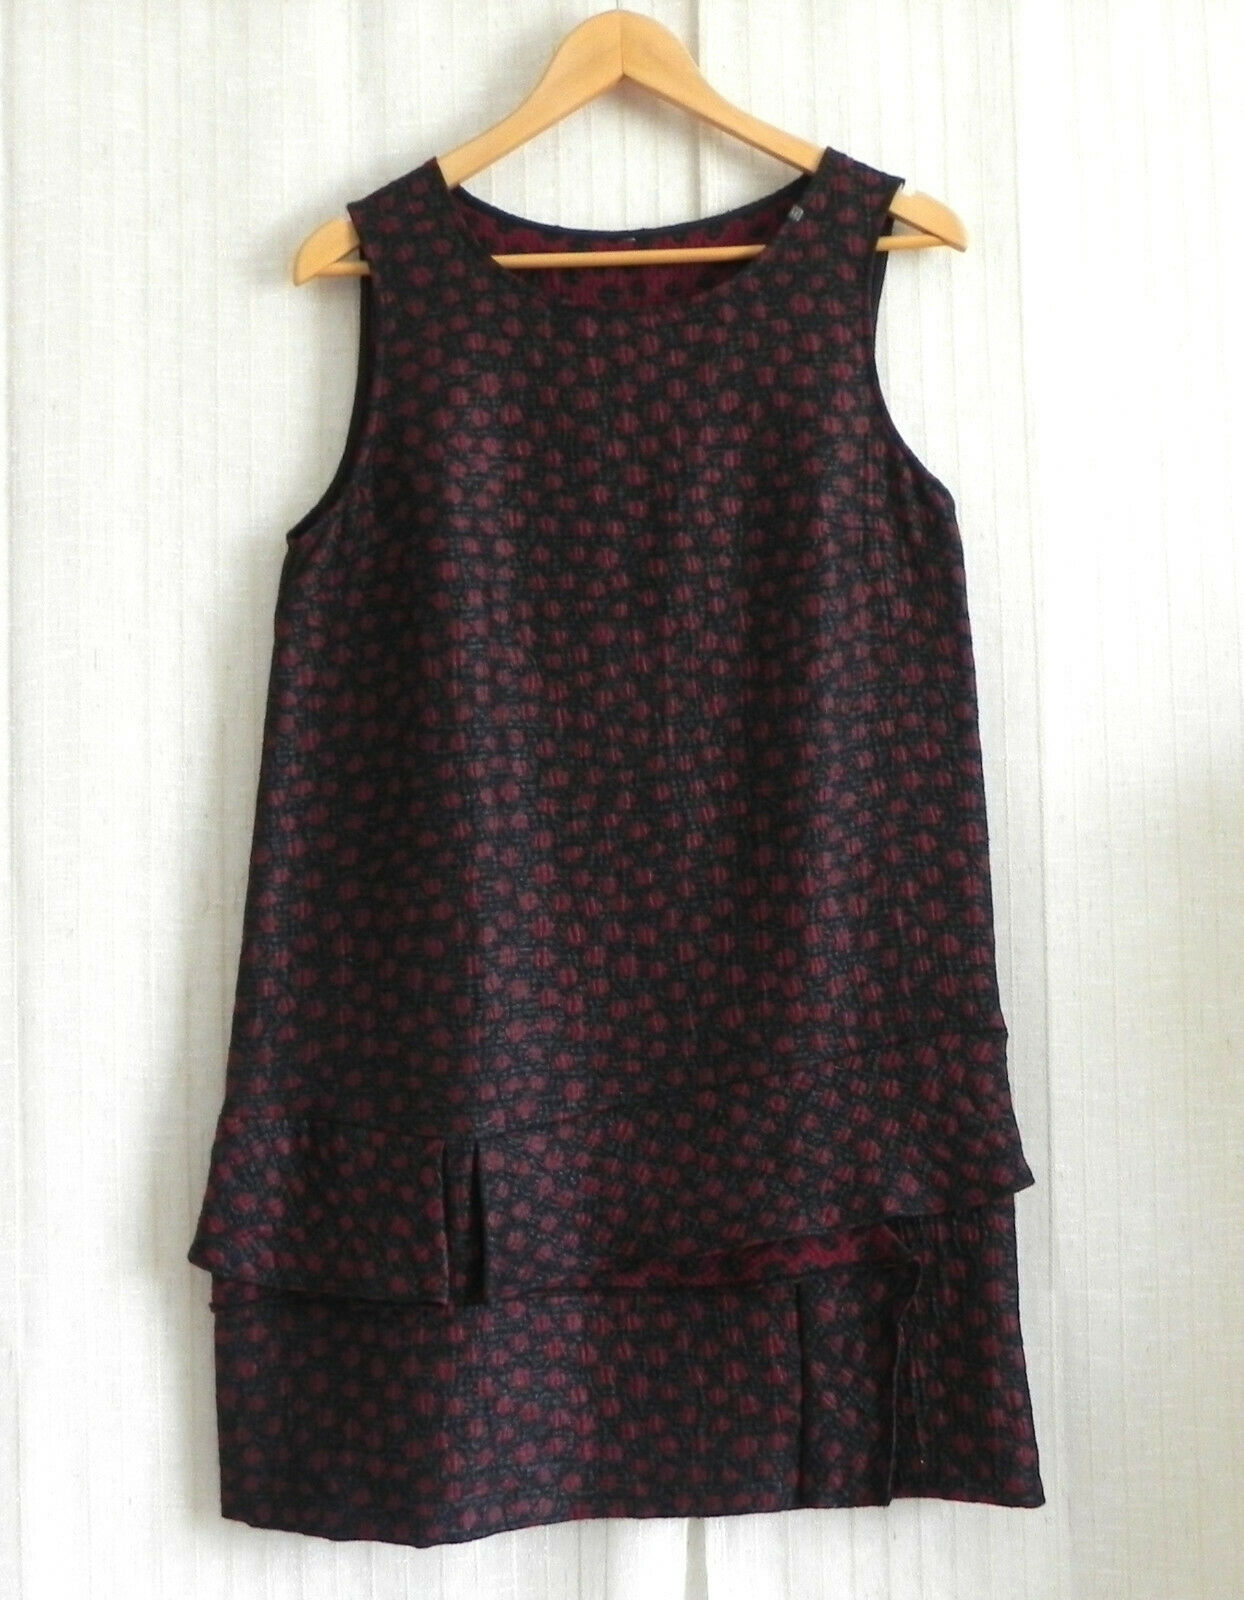 COP.Copine Dress Sleeveless Cotton Blend Grünigo Rosa Tunic Style Größe 40(US L)